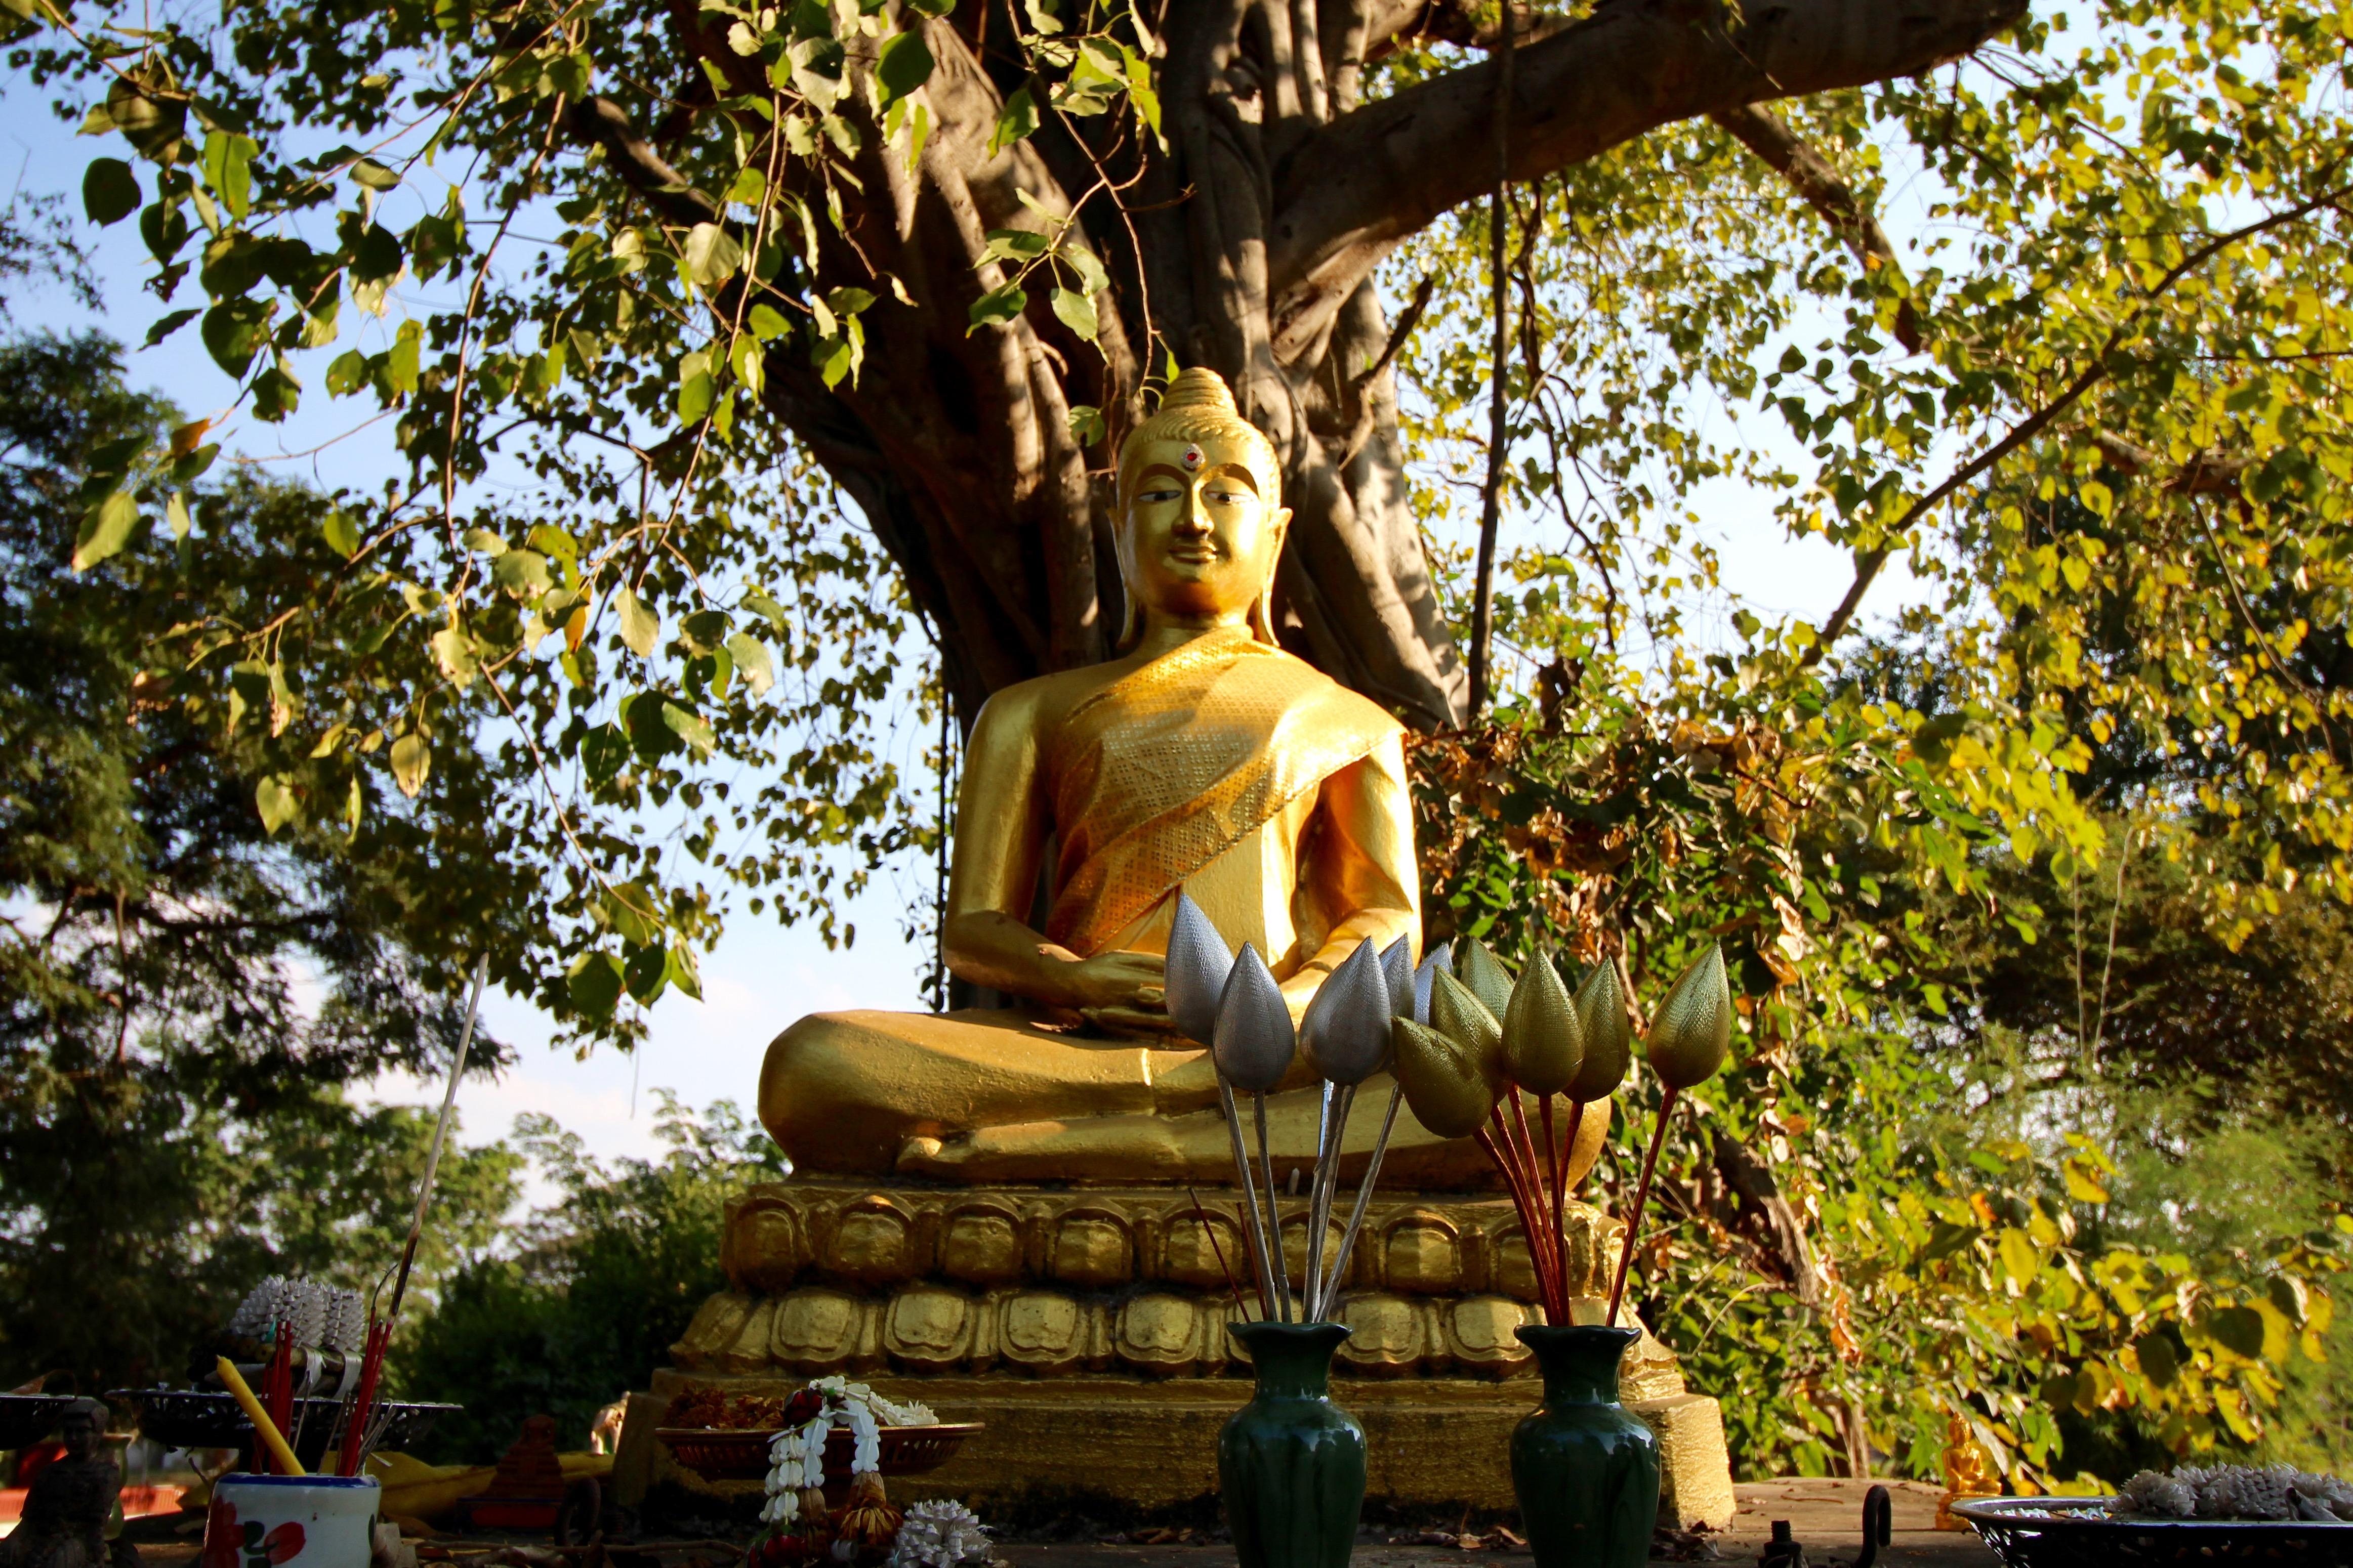 A buddha statue in Ayutthaya, Thailand